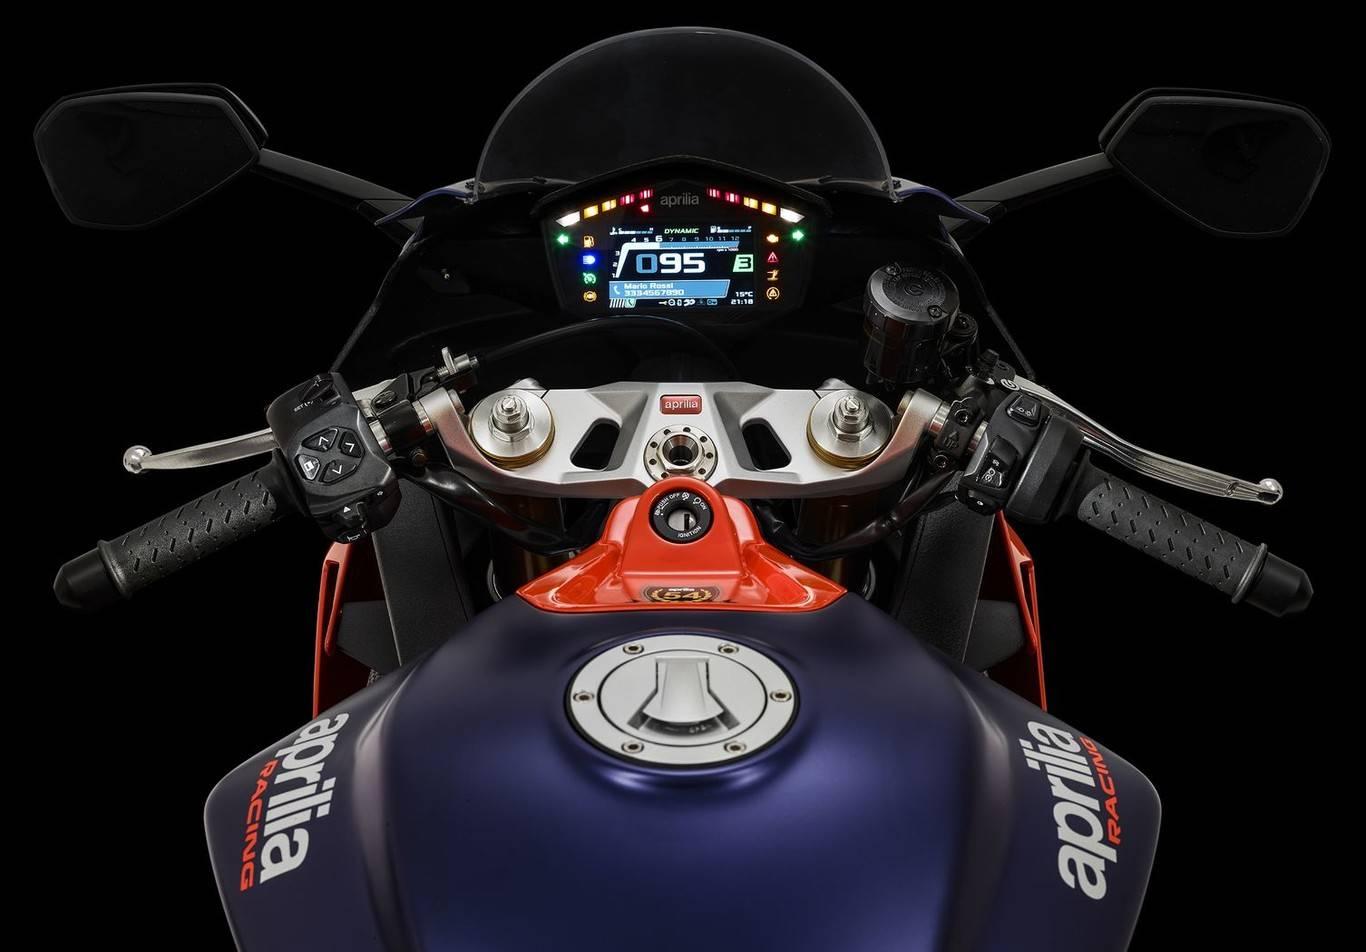 aprilia rs660 2020 speedo